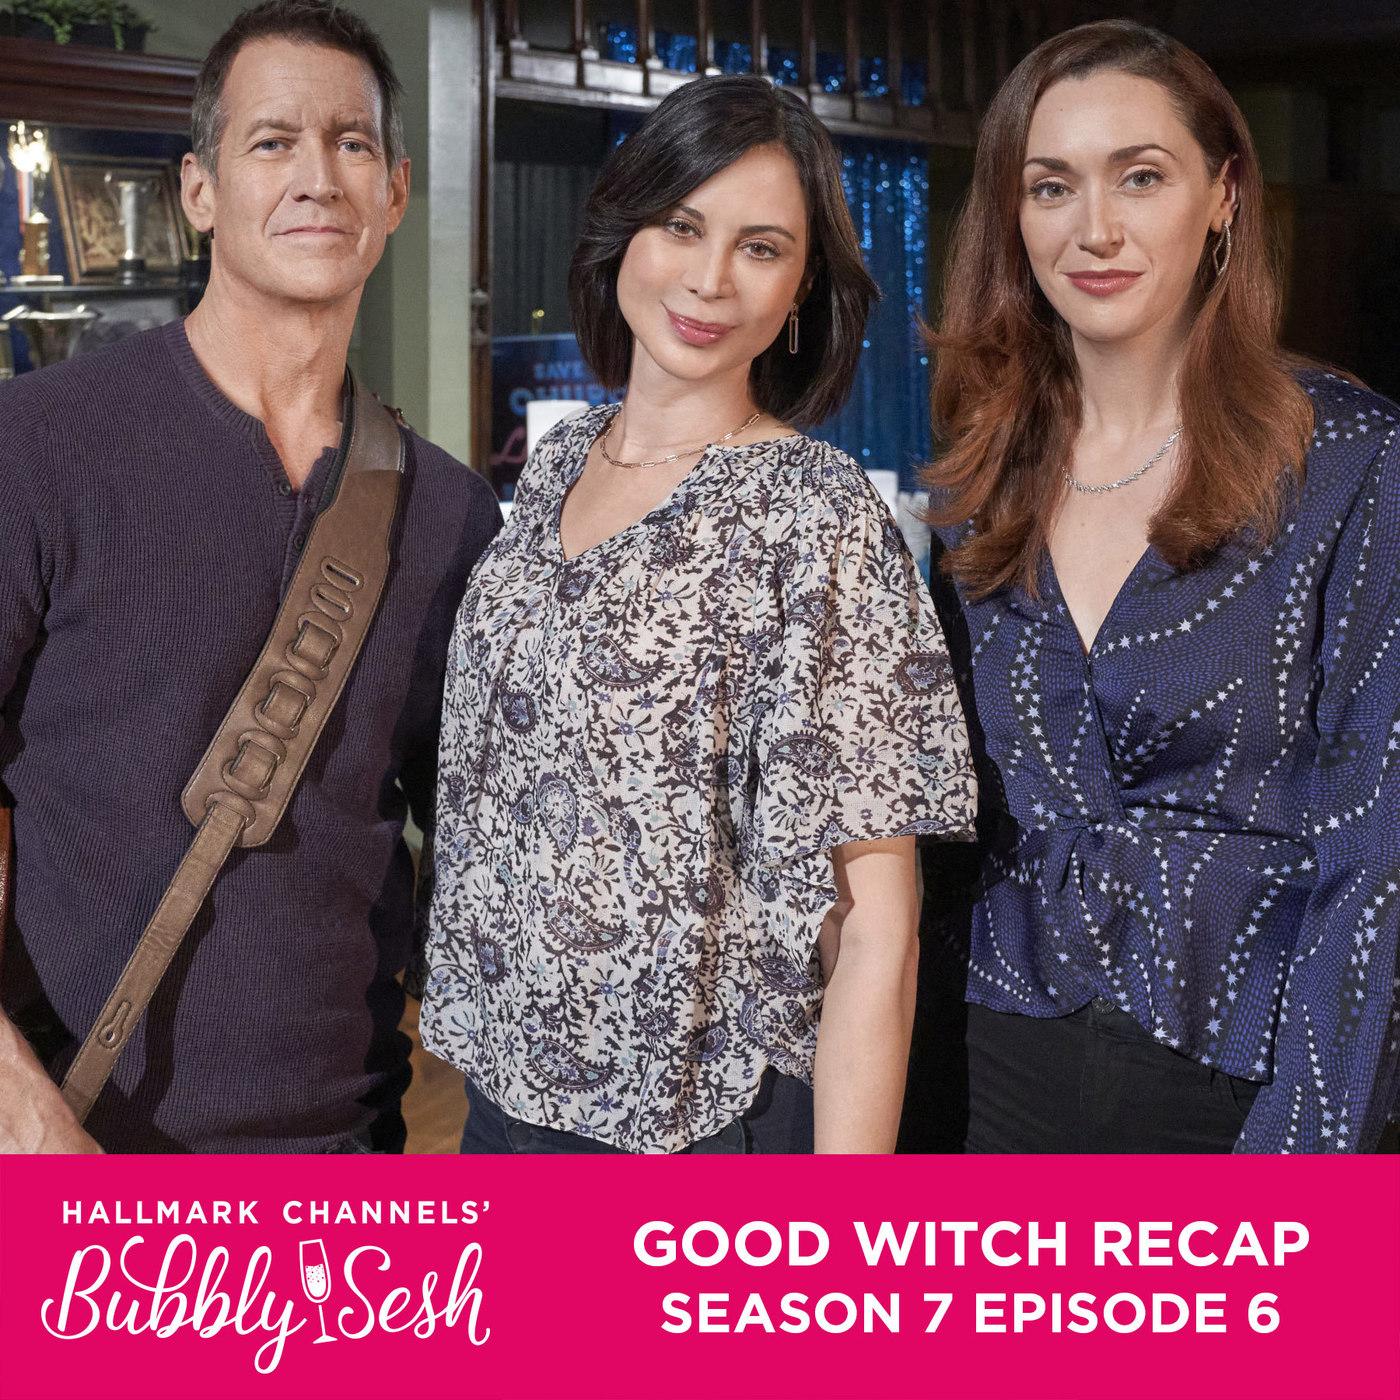 Good Witch Season 7 Episode 6 Recap